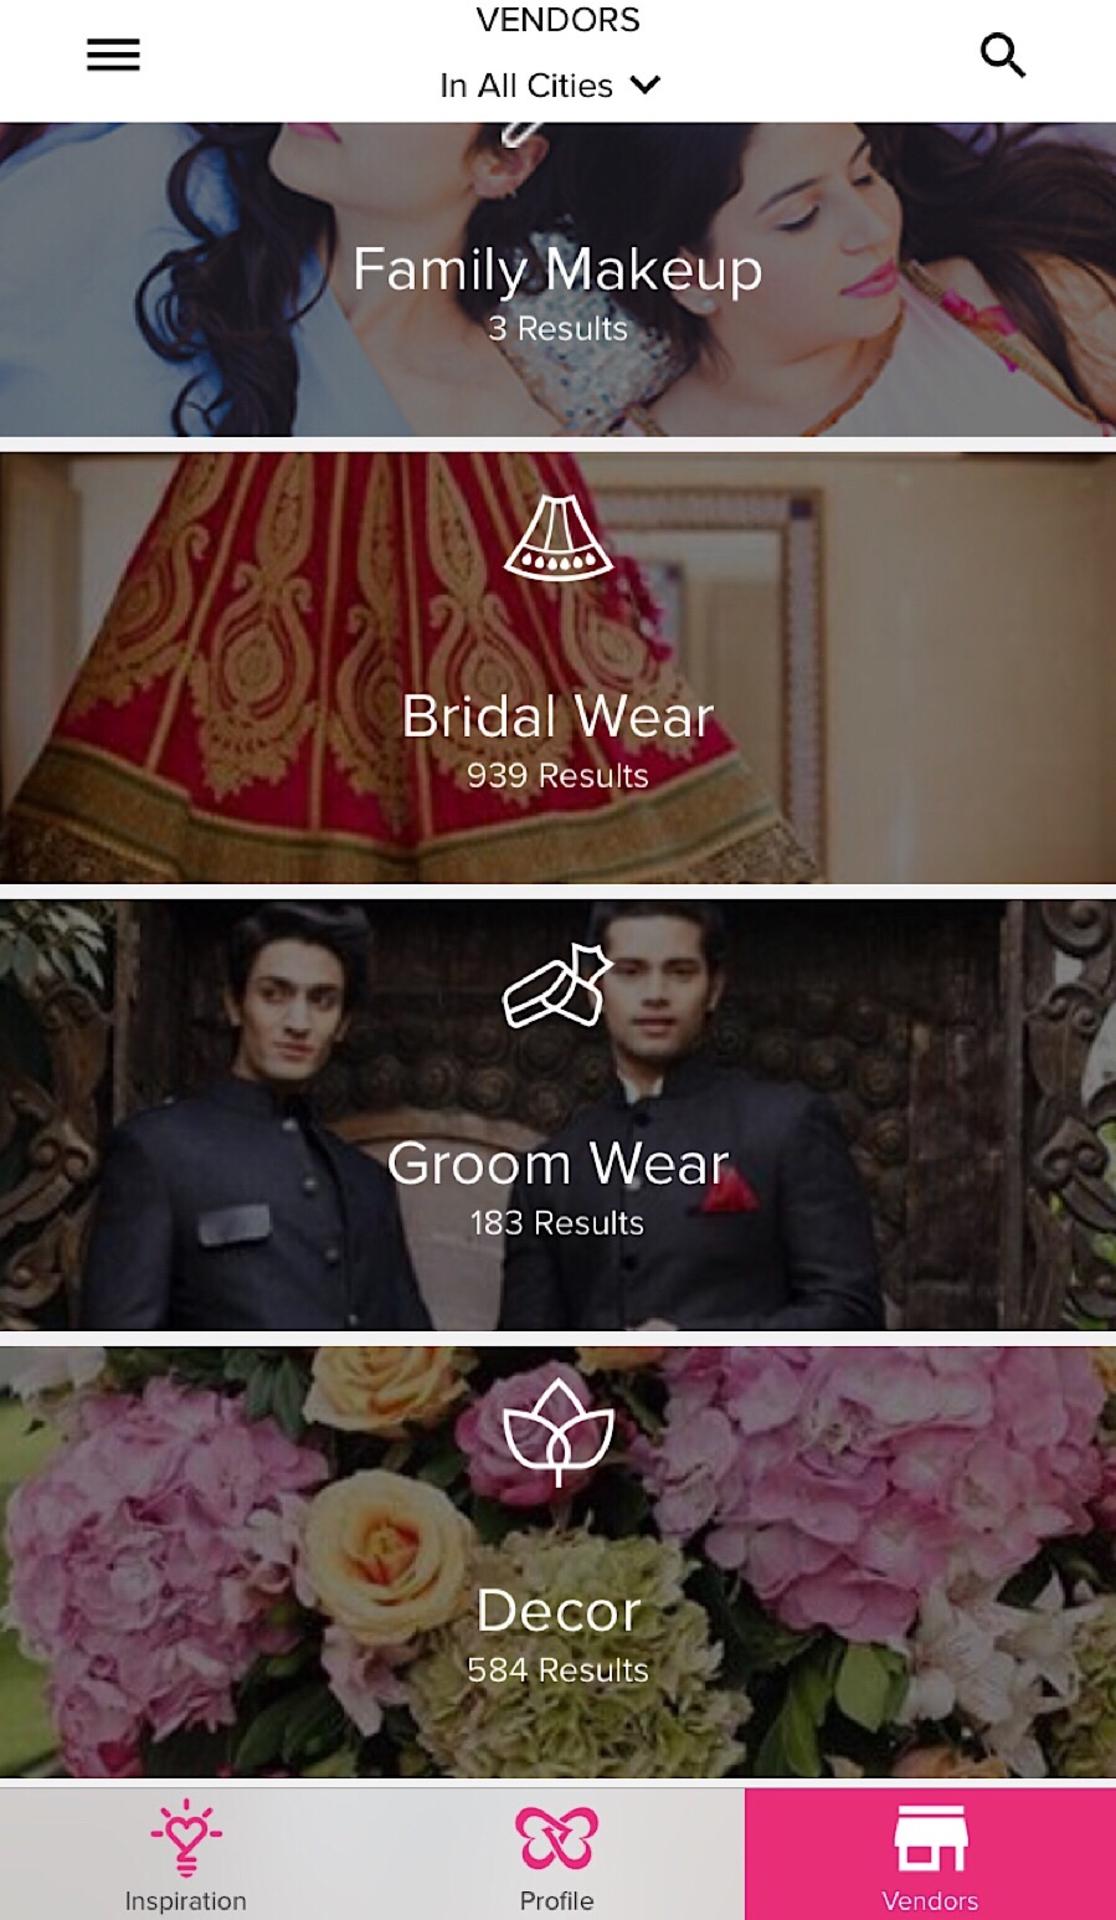 THE GLAM NUT - Fashion & Lifestyle Blog - F463B1B8-CCF0-430B-8AB5-87E3F3DE1CD5